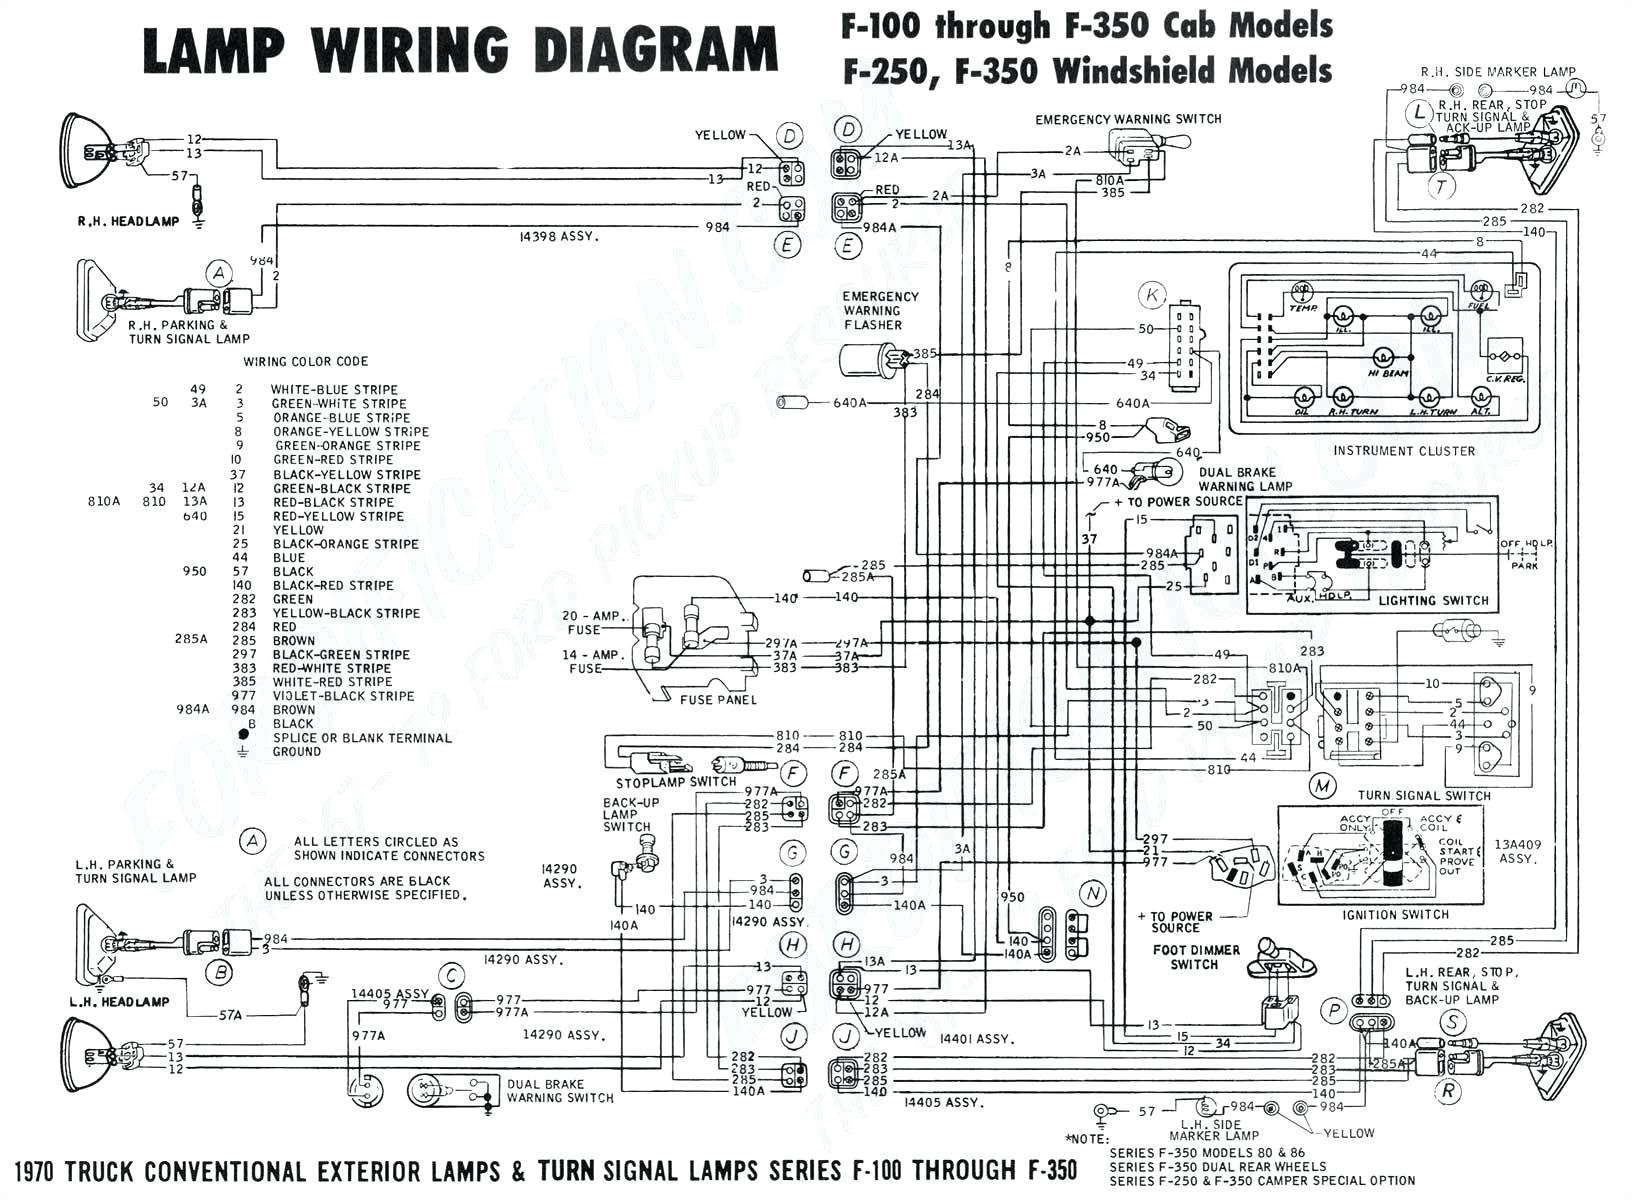 leviton decora 4 way switch wiring diagram